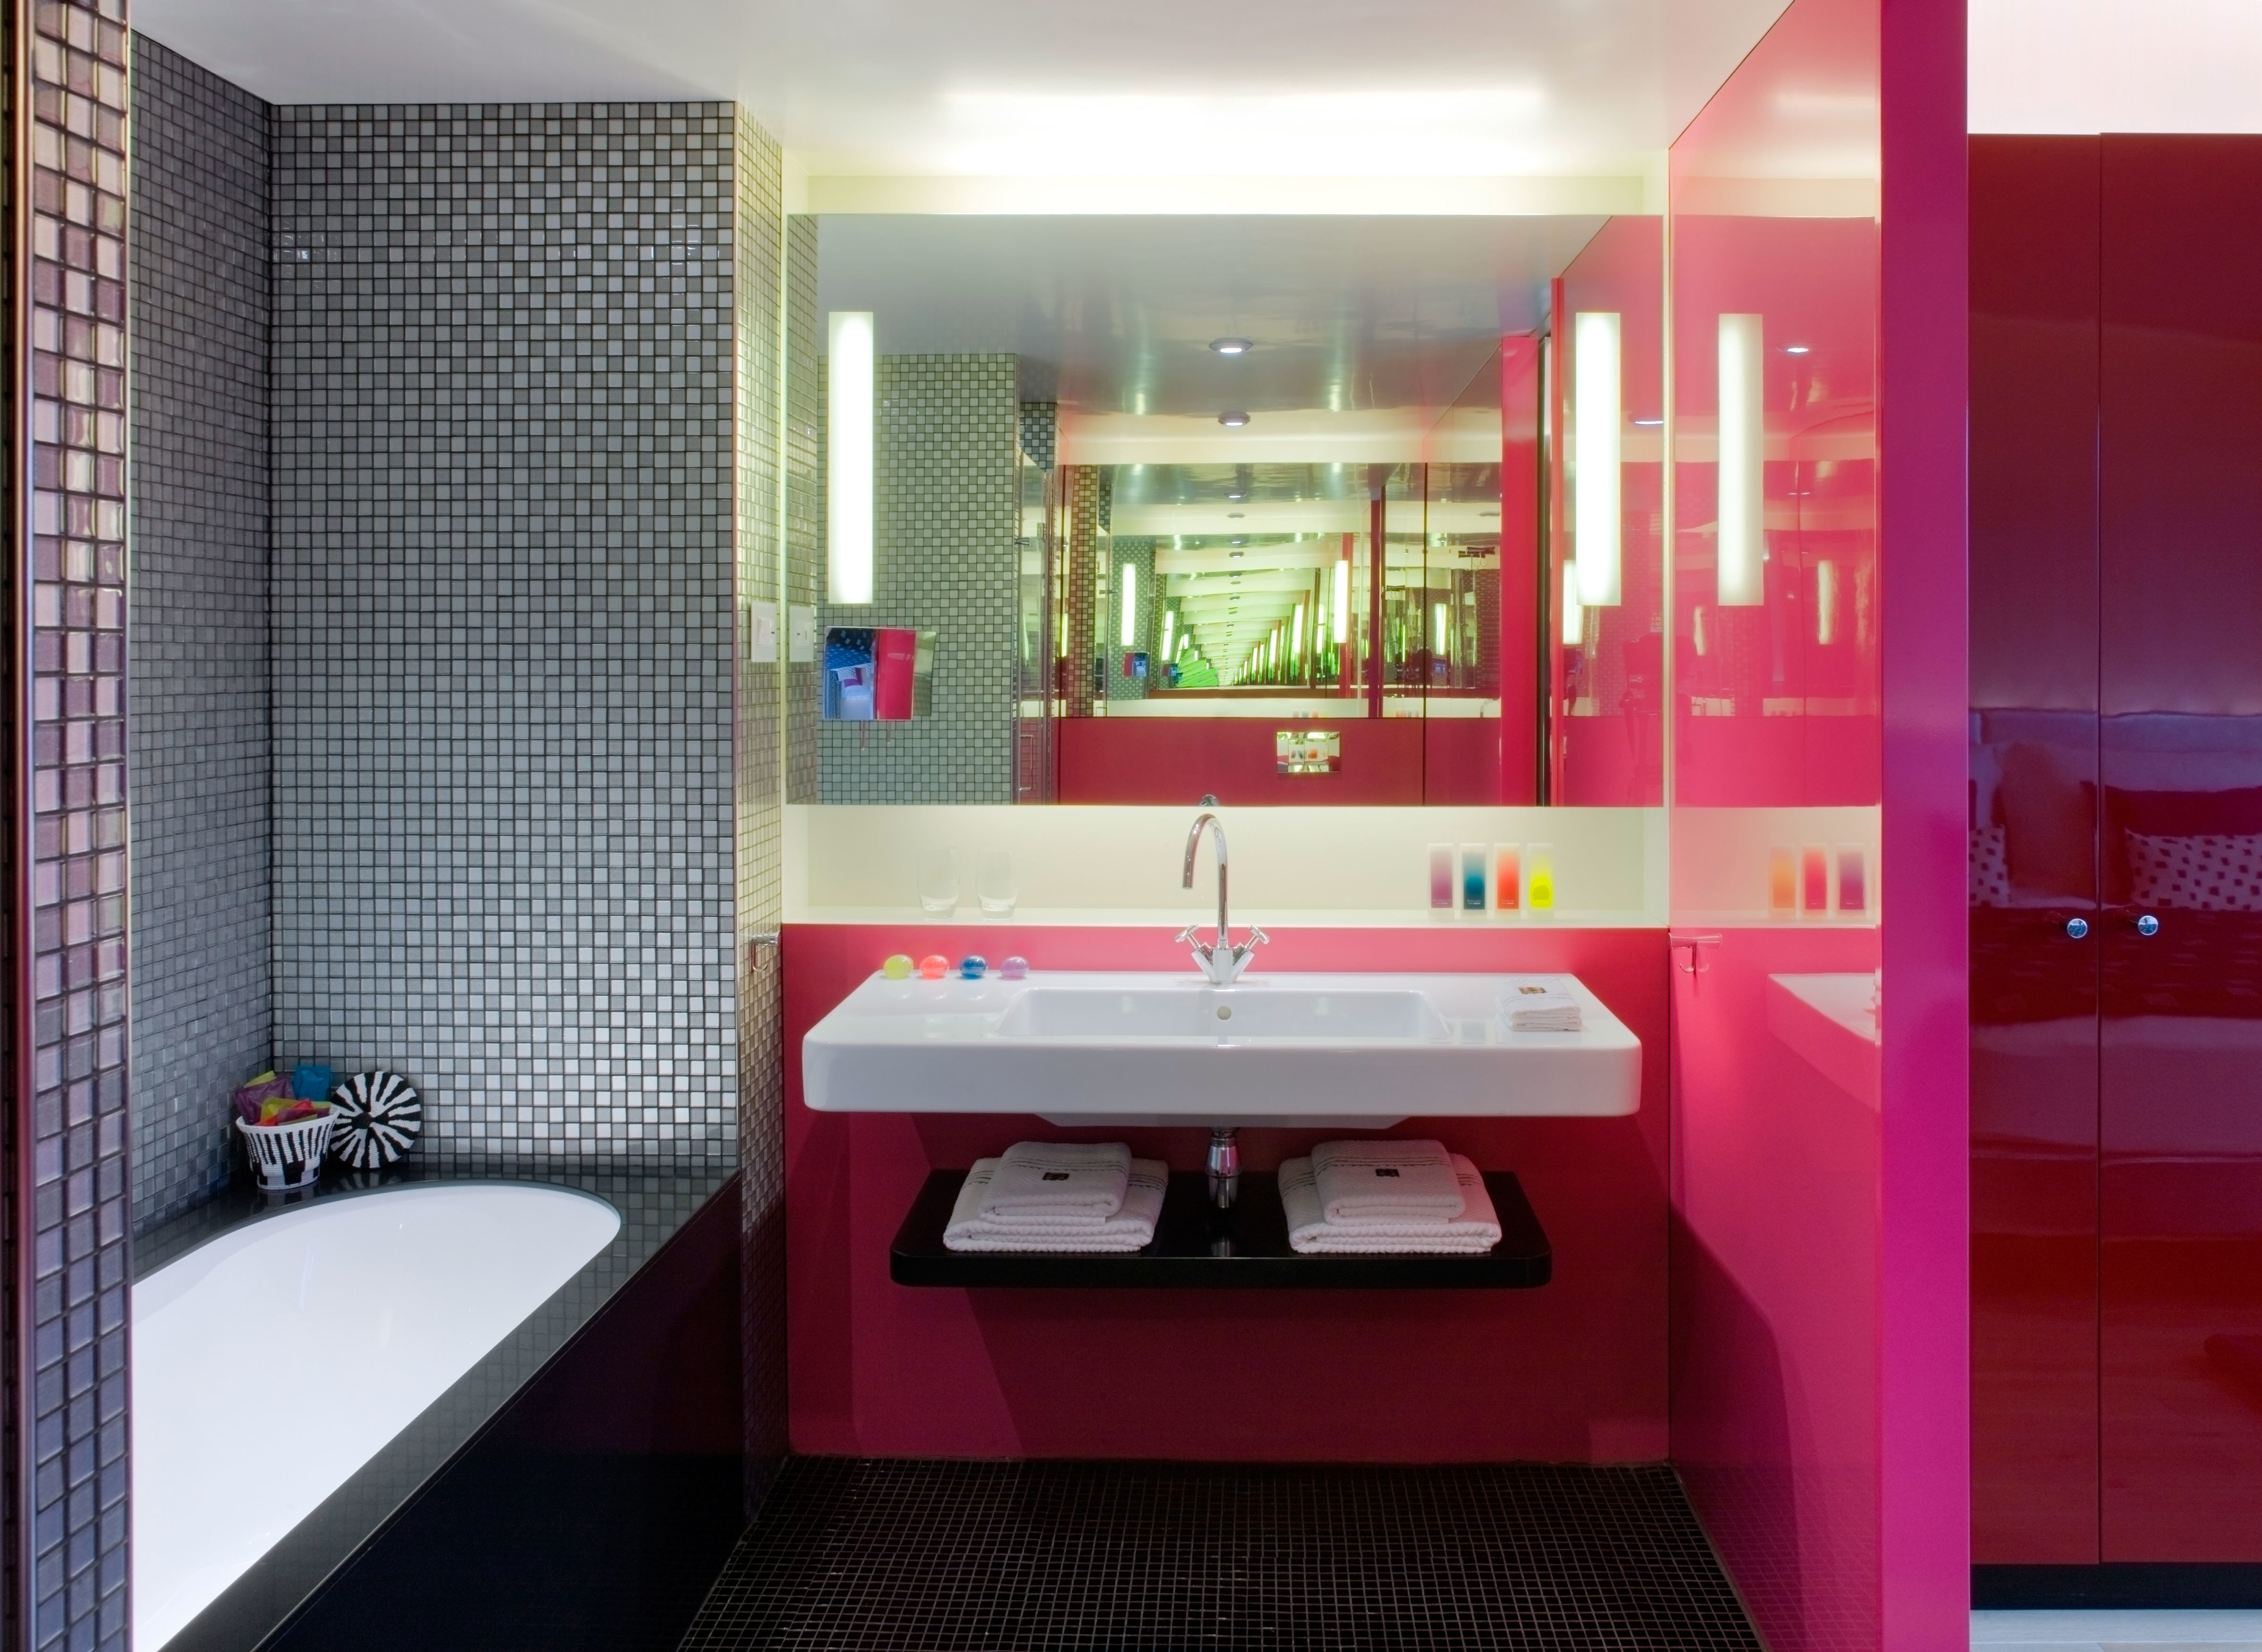 Bath Hip Modern bathroom property red sink Suite toilet tiled